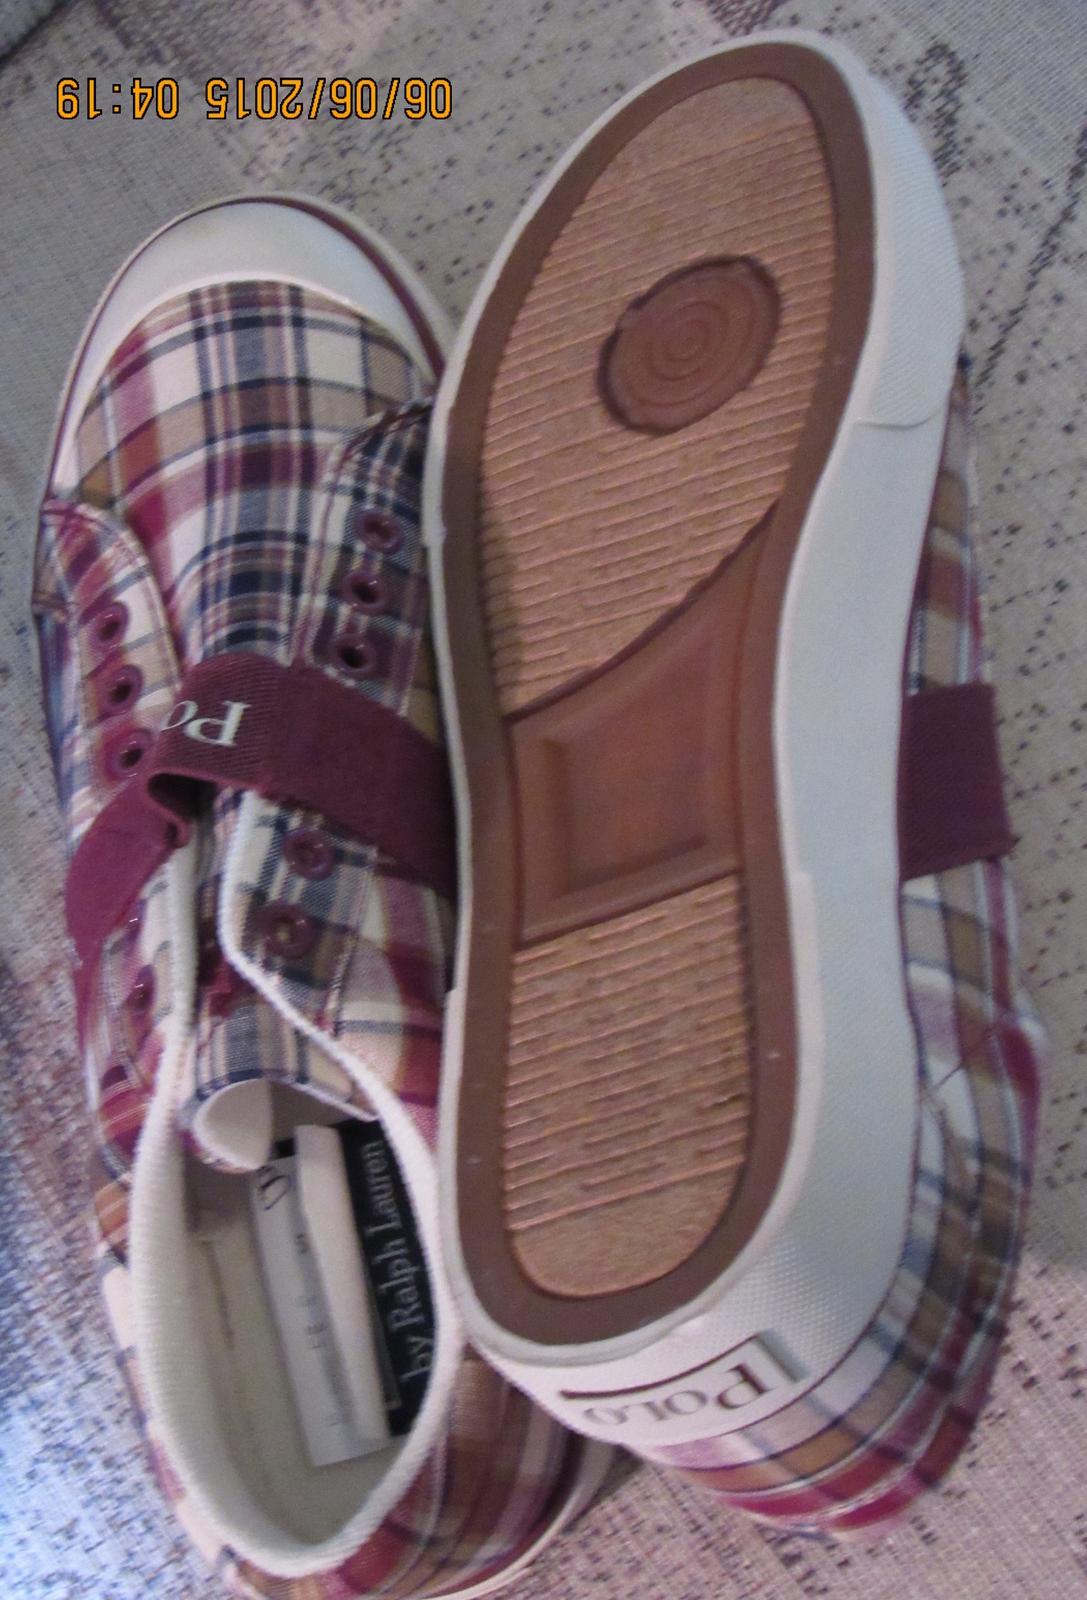 Polo Ralph Lauren BLUE LABEL Men's GARDENER Sneaker CANVAS PLAID 9,10,11,12D NEW